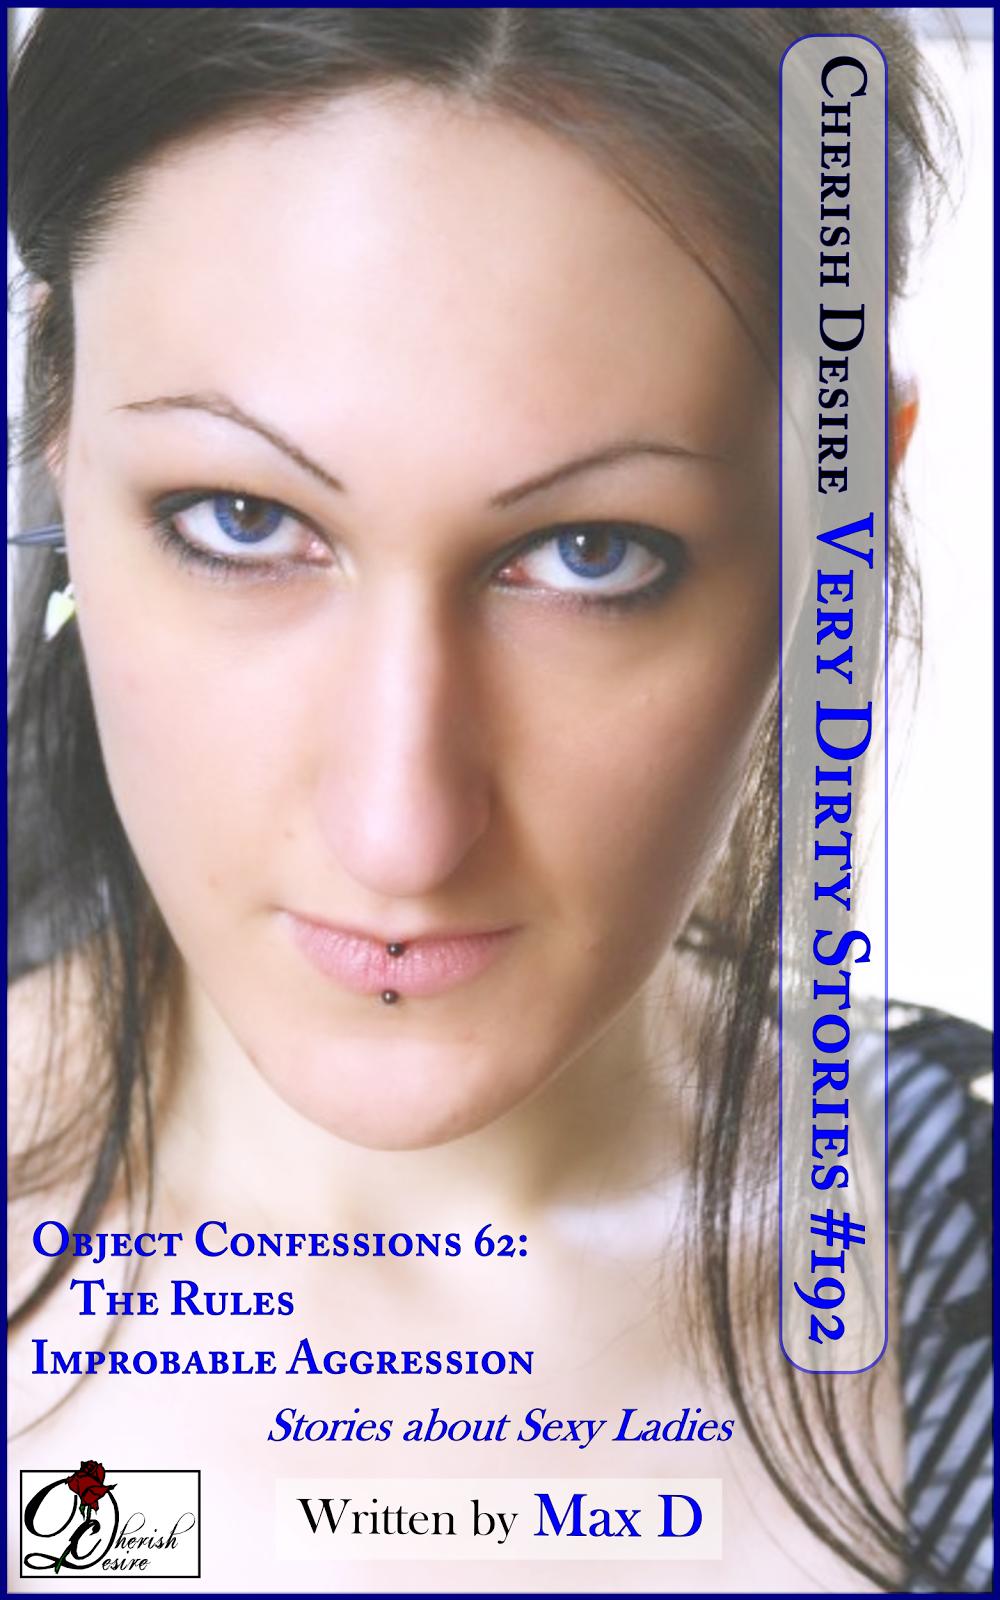 Cherish Desire: Very Dirty Stories #192, Max D, erotica